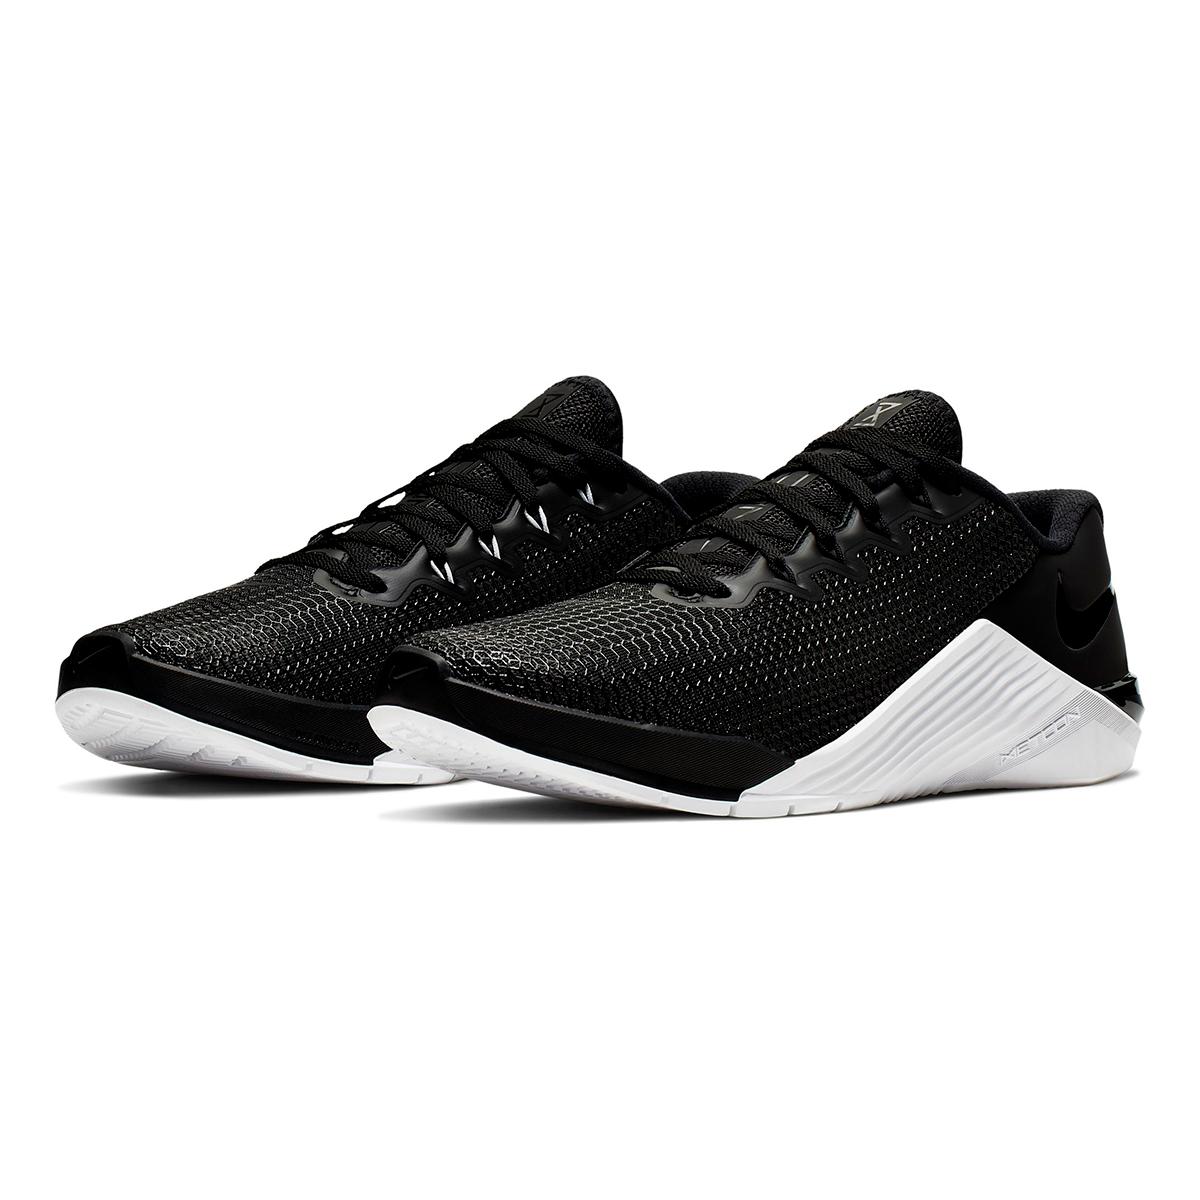 Women's Nike Metcon 5 Training Shoes  - Color: Black/Black White/Wolf Grey - Size: 5 - Width: Regular, Black/Black White/Wolf Grey, large, image 4